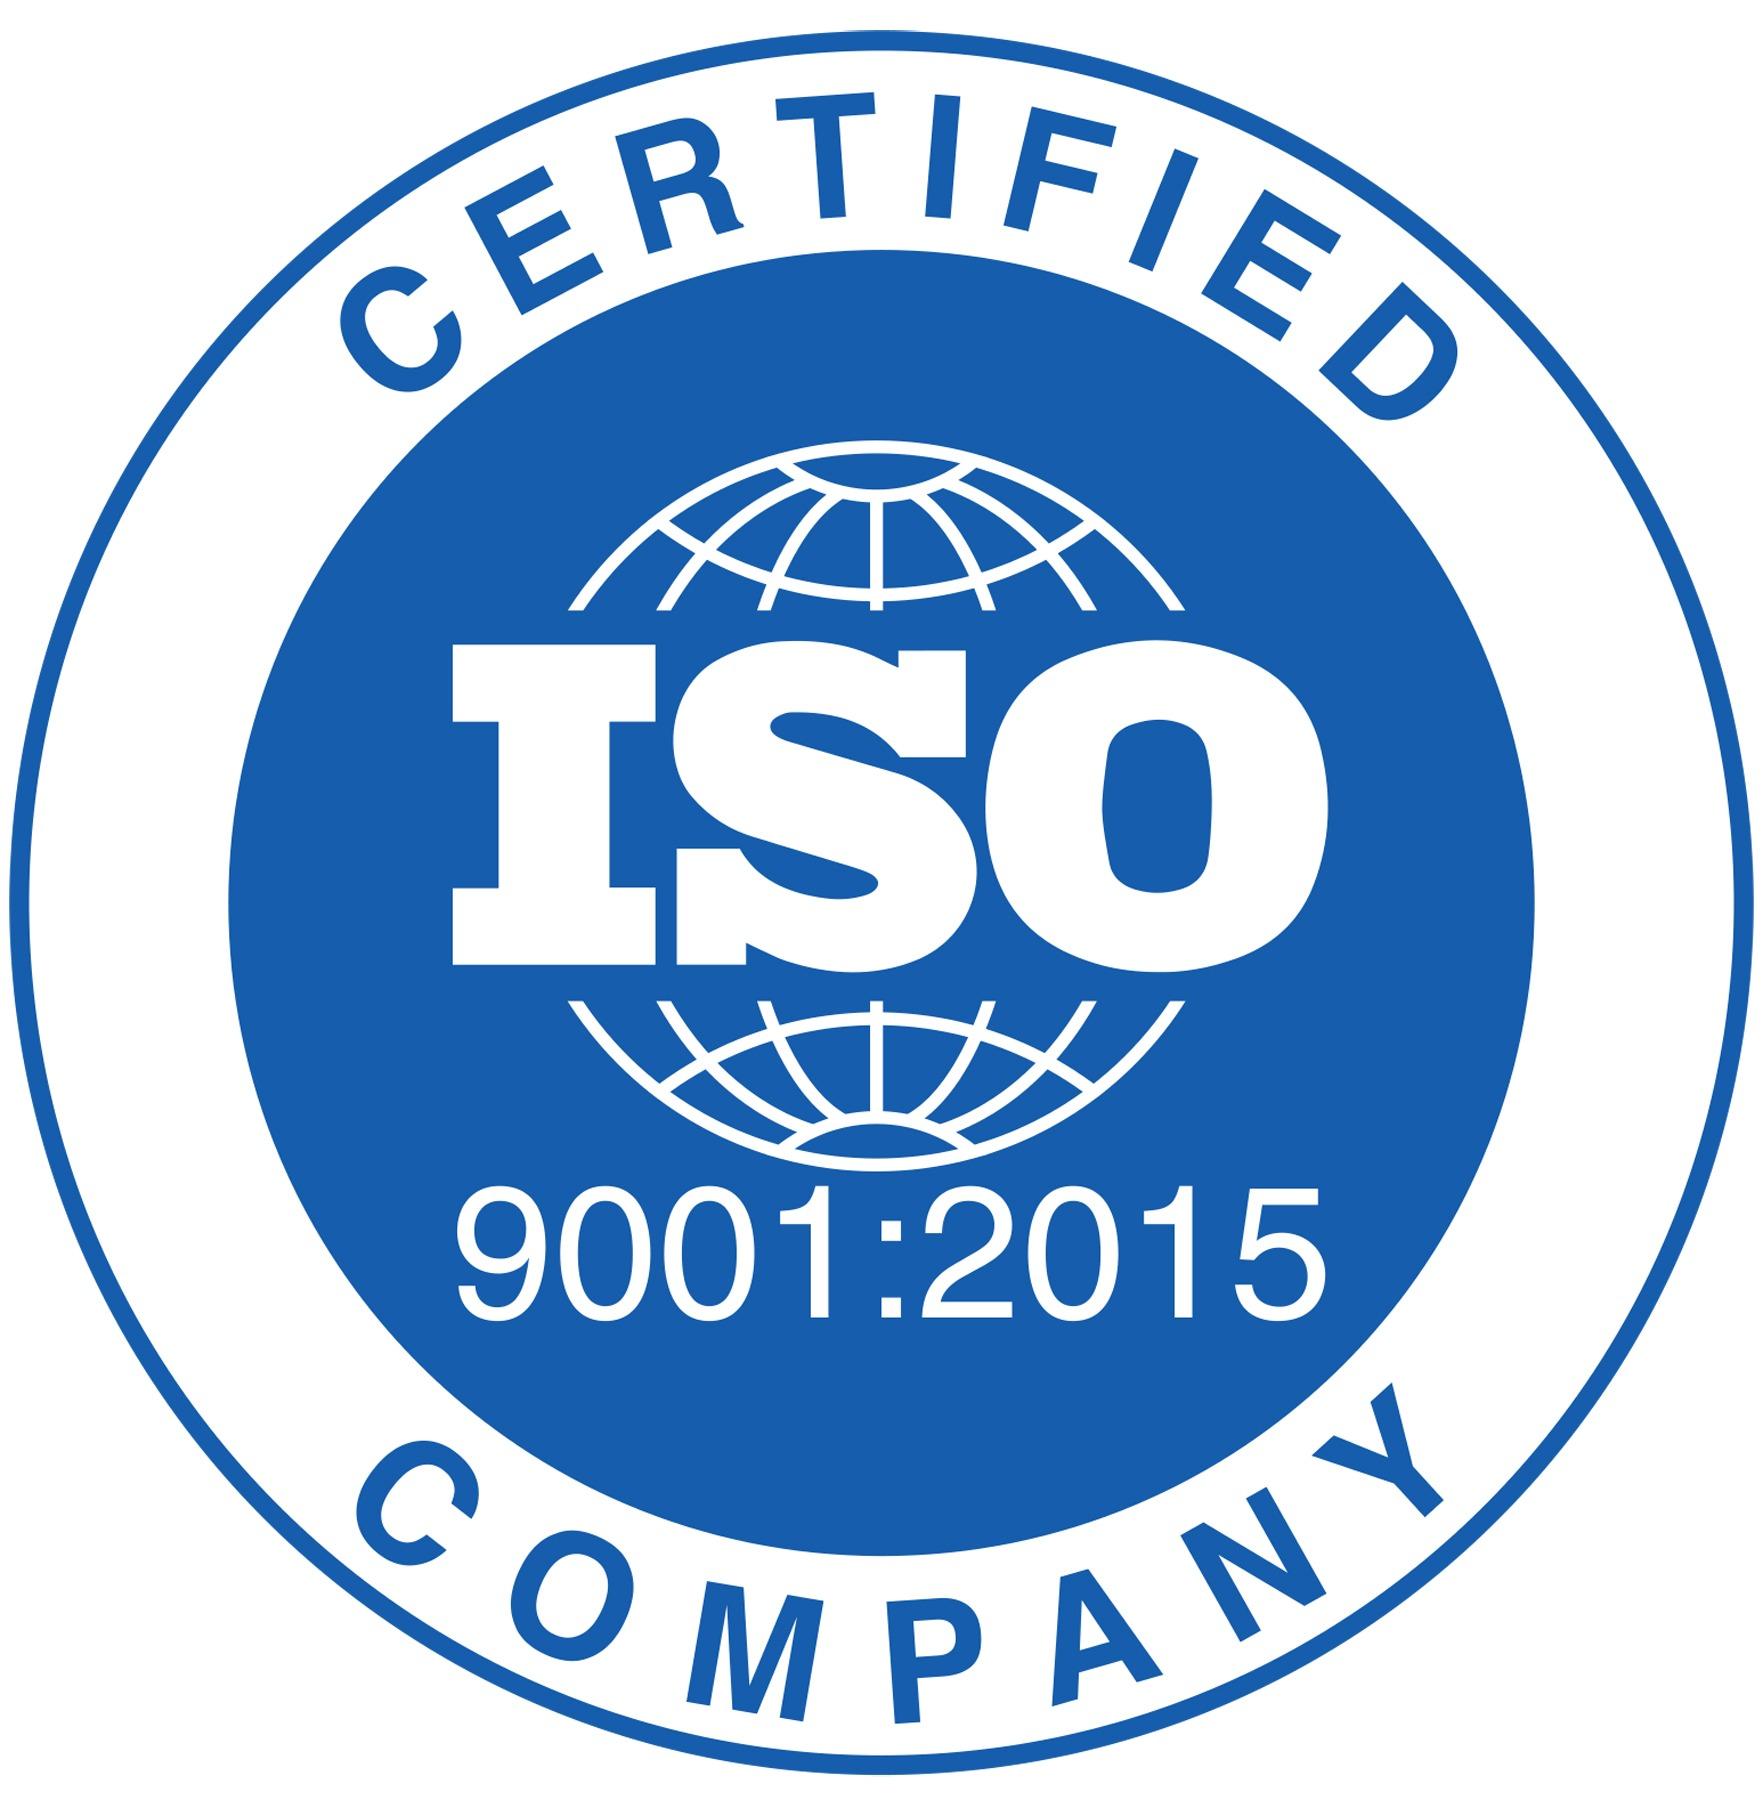 Pajmon posiada ISO 9001:2015